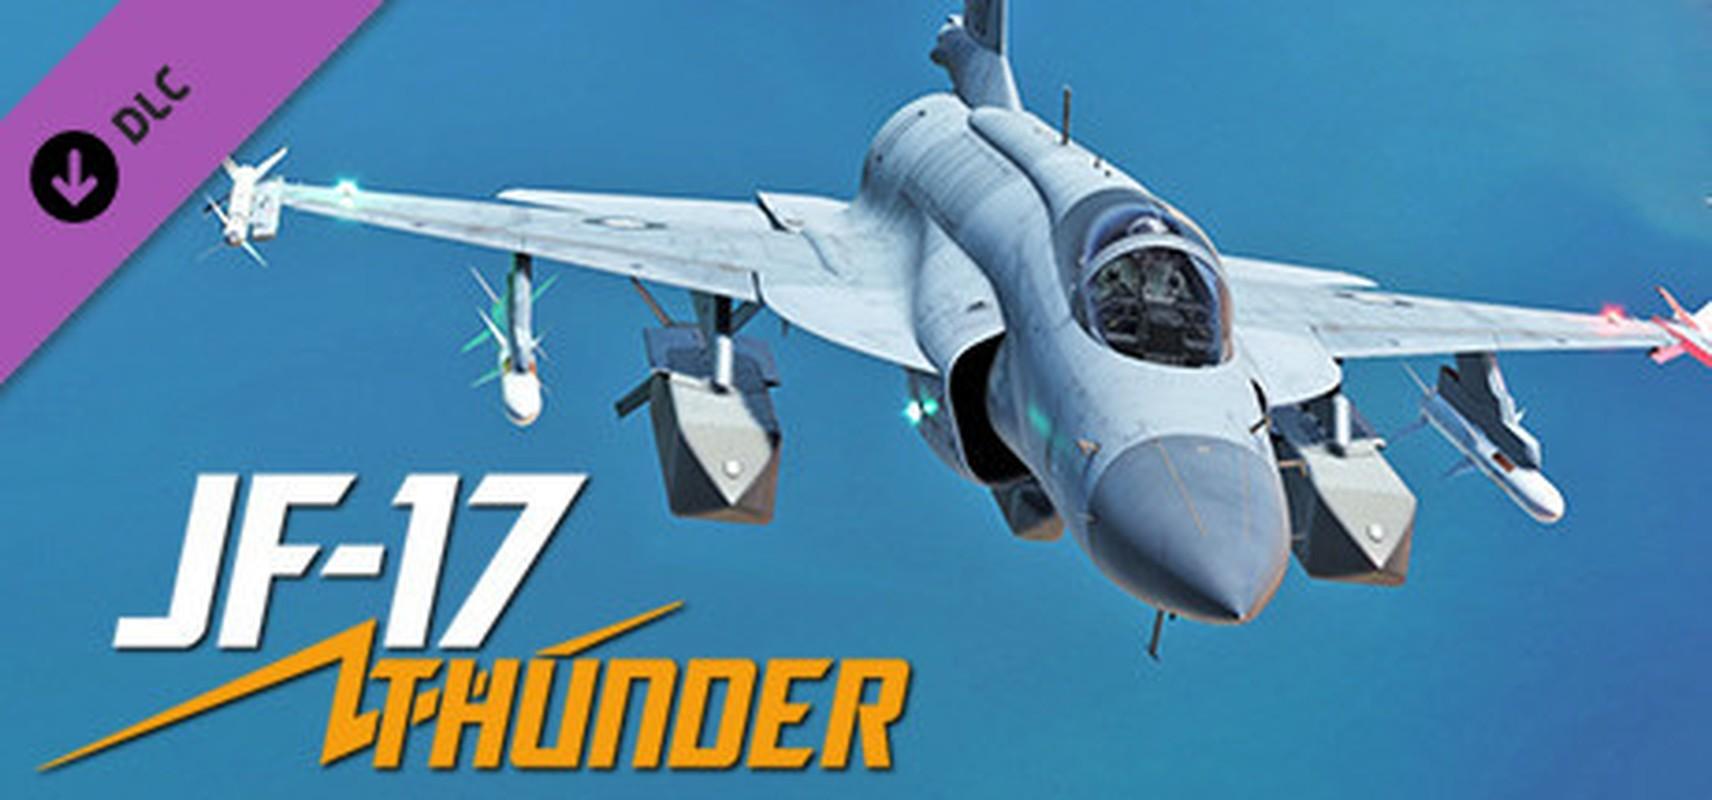 Ly do JF-17 khong bao gio thay the duoc F-16 trong Khong quan Pakistan?-Hinh-3